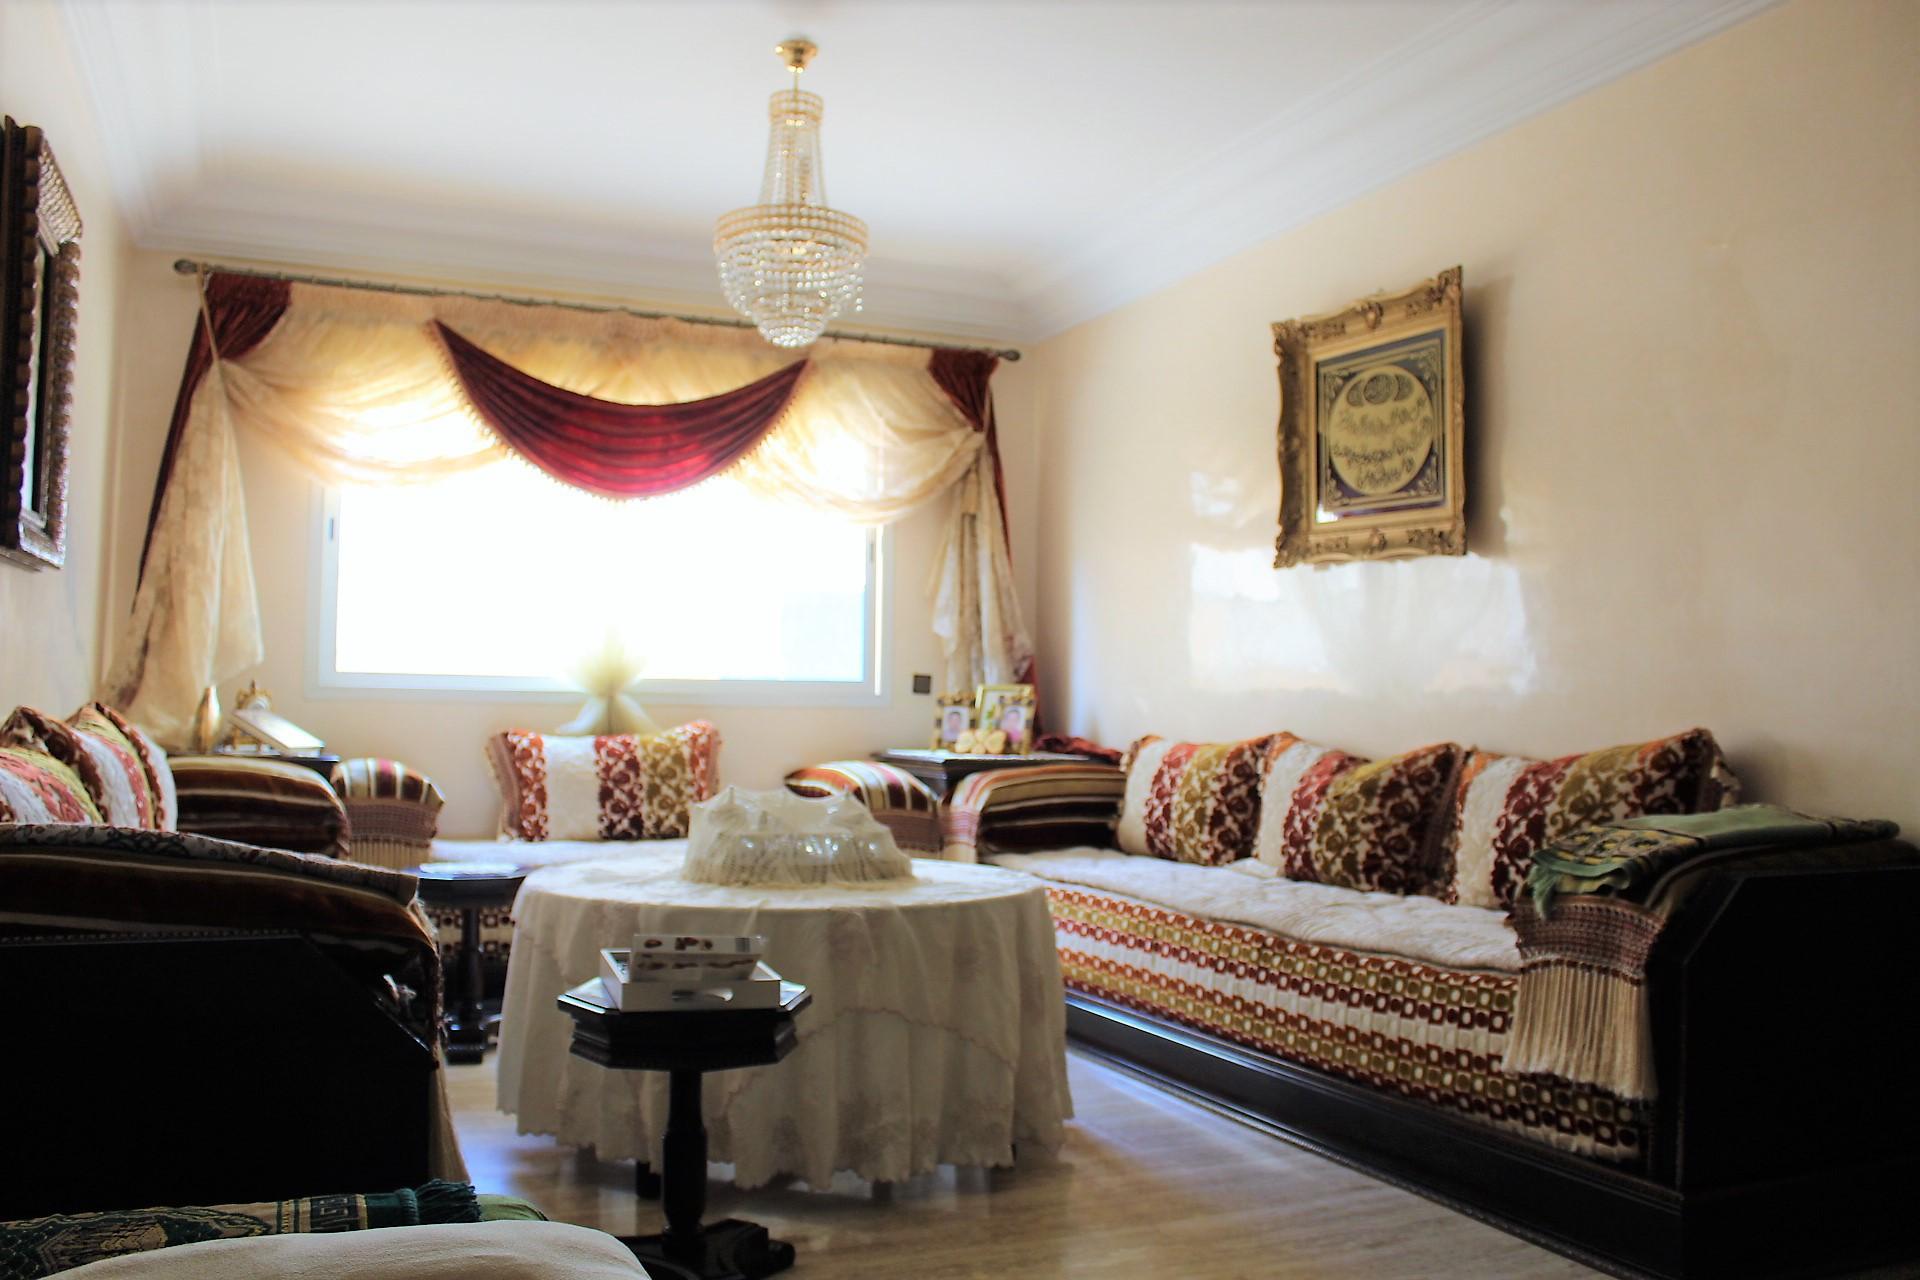 Maroc, Casablanca, maarif (secteur Fourate/ Bir anzarane) à acheter parfait logement de 115 M2 avec grande terrasse de 38 M2.